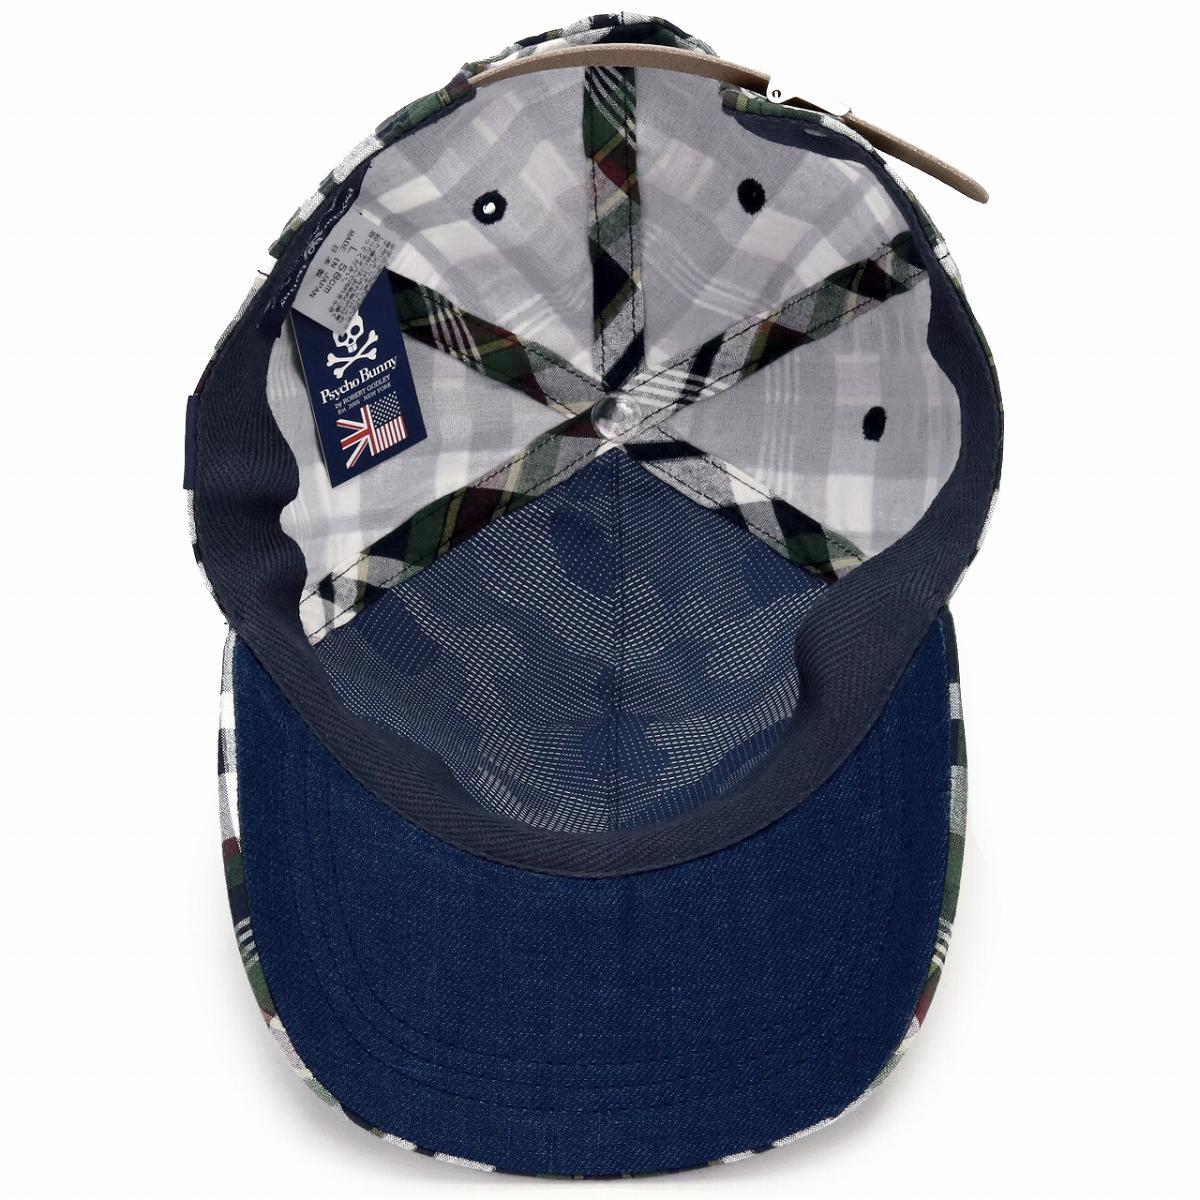 d4acac61b1e ... Bupleurum Root bunny hat checked pattern soccer cloth awning baseball  cap gentleman casual hat Lady's rabbit ...